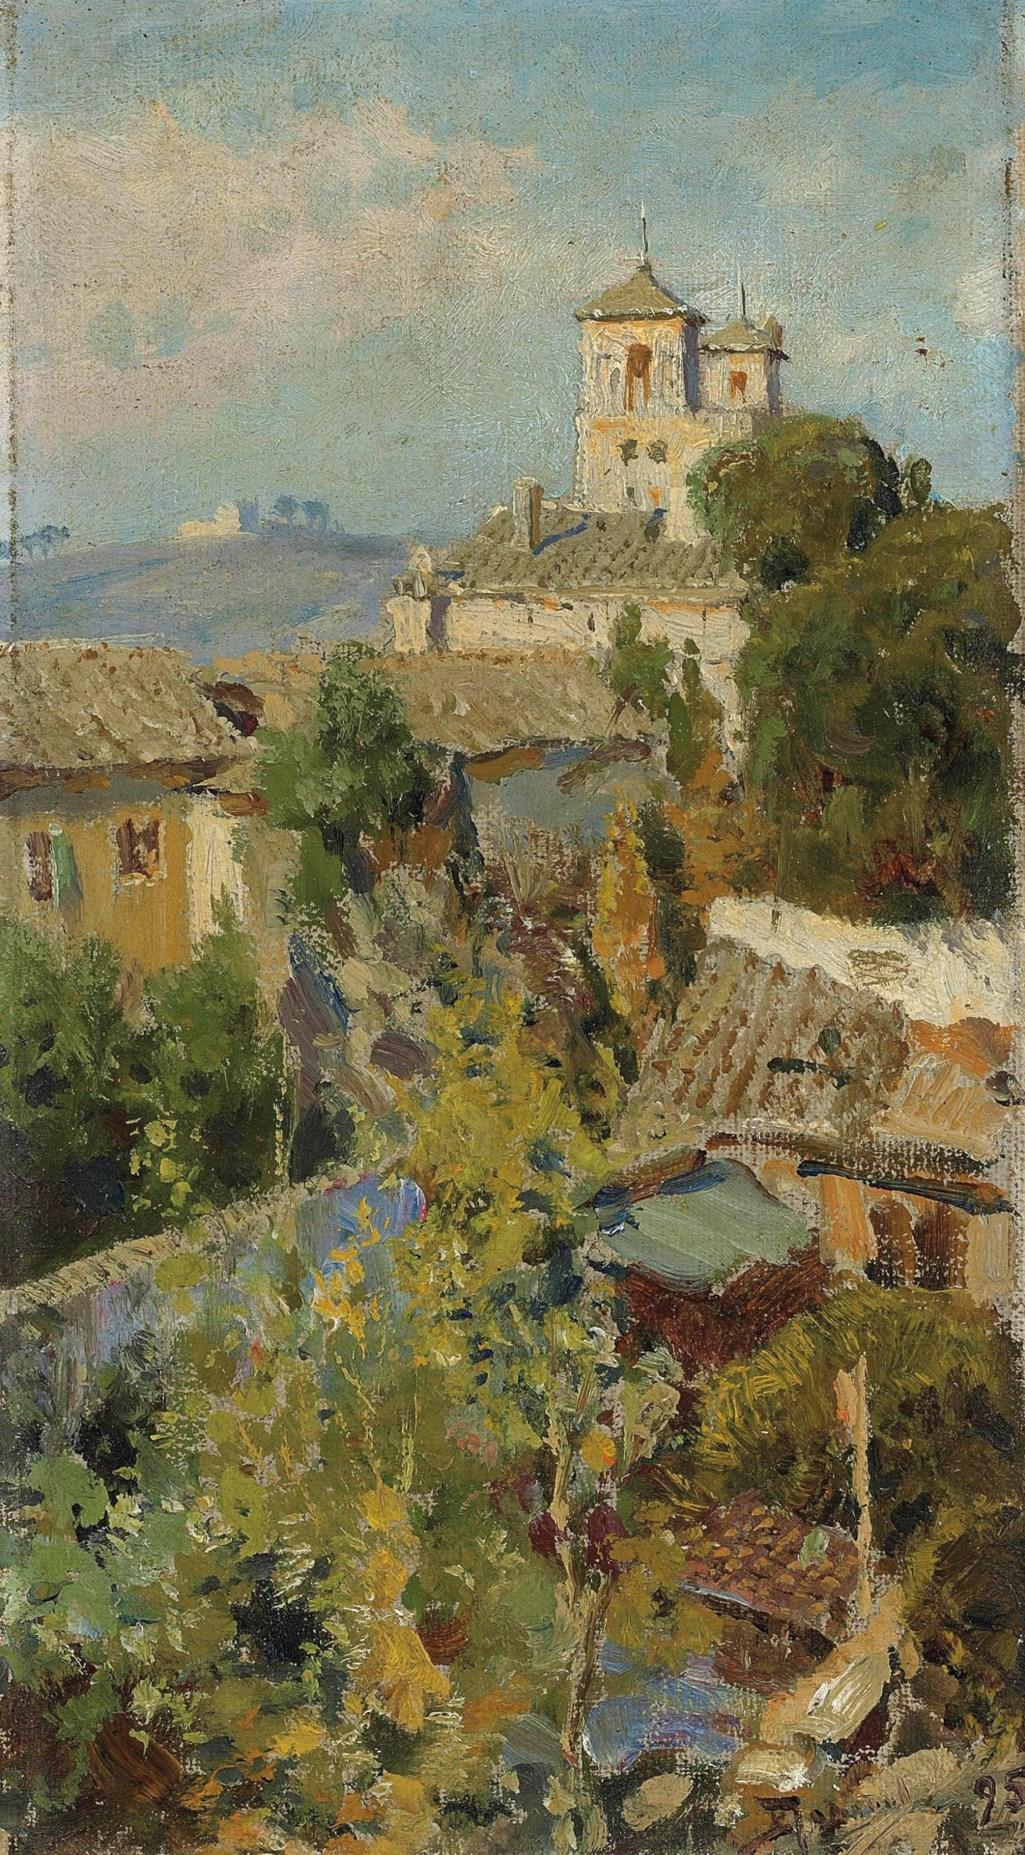 Vasilii Polenov (1844-1927) From the window of the flat in Rome / Василий Поленов (1844-1927) Из окна квартиры в Риме